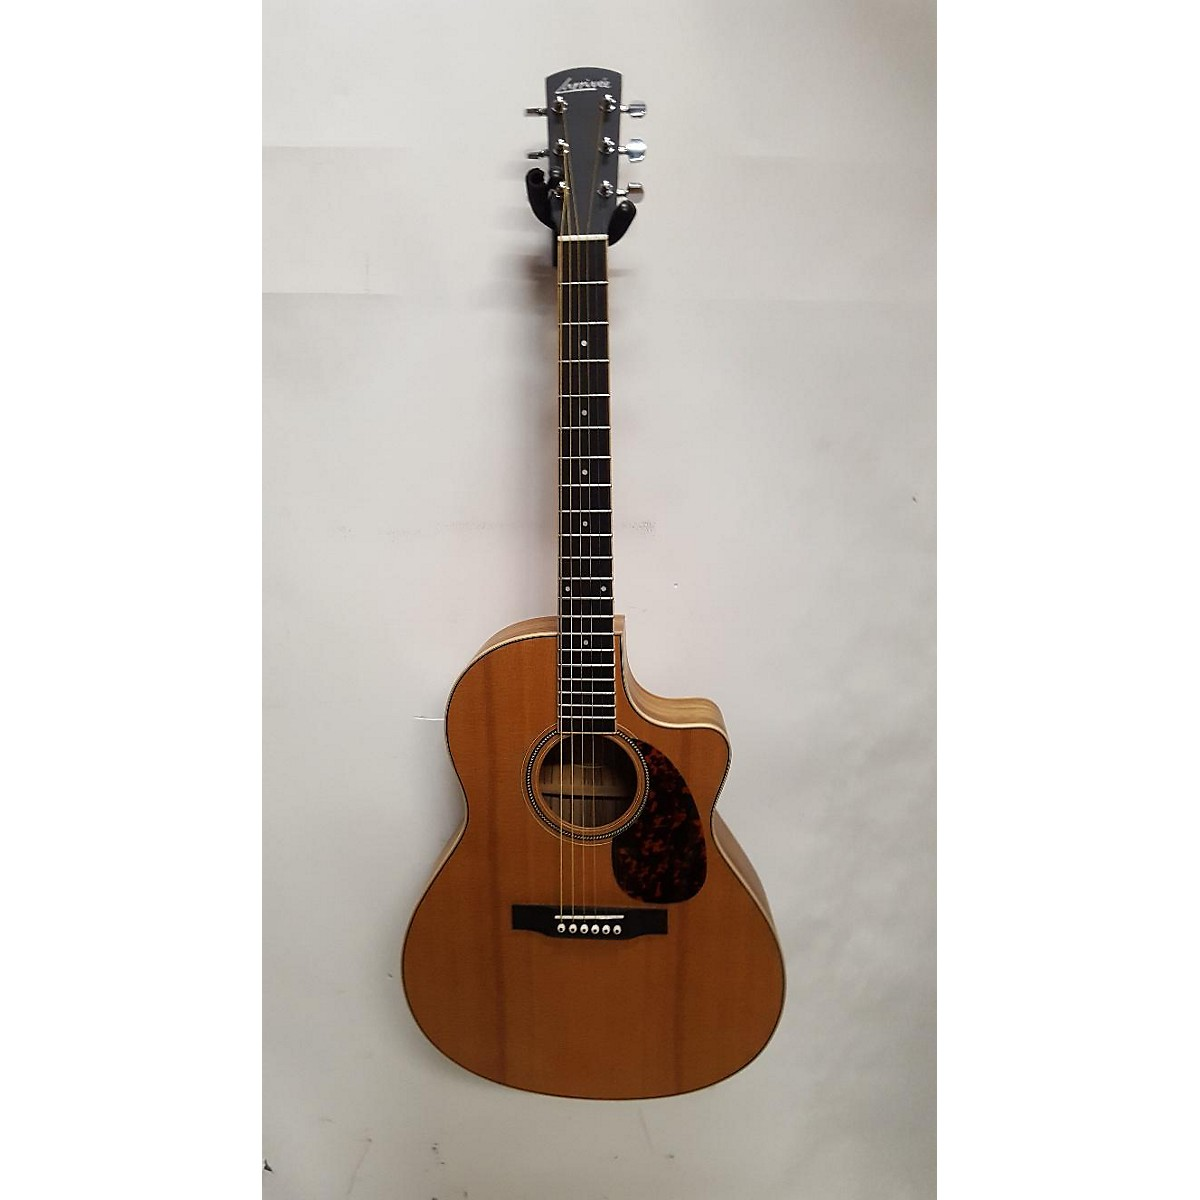 Larrivee LV03Z Acoustic Electric Guitar